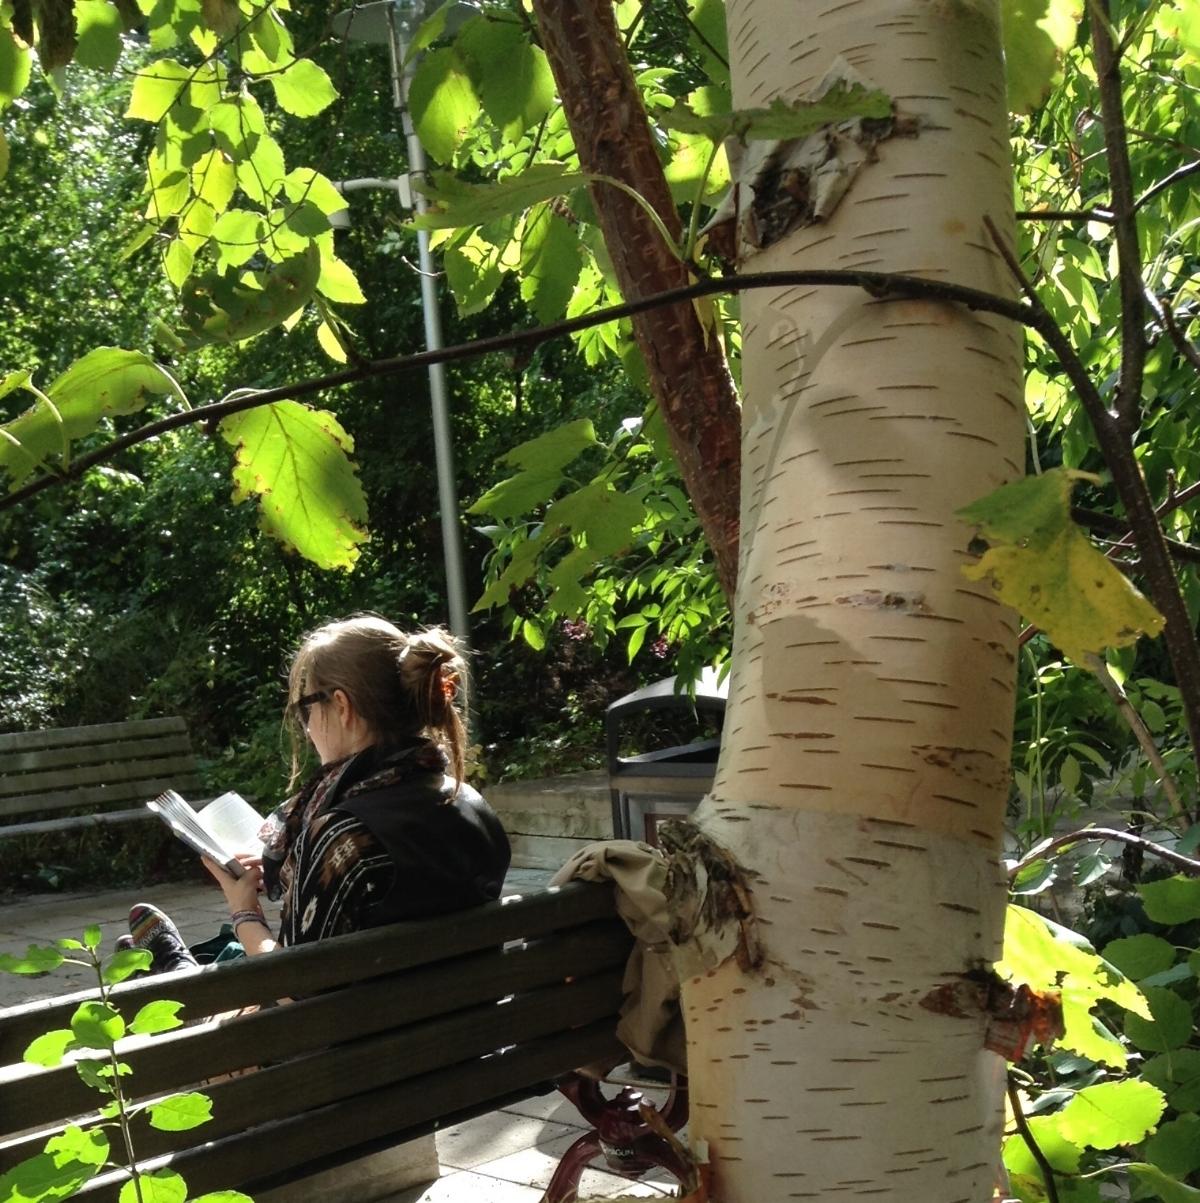 Visitor at the Husky Energy Courtyard, University of Ottawa. Photo: Renate Sander-Regier